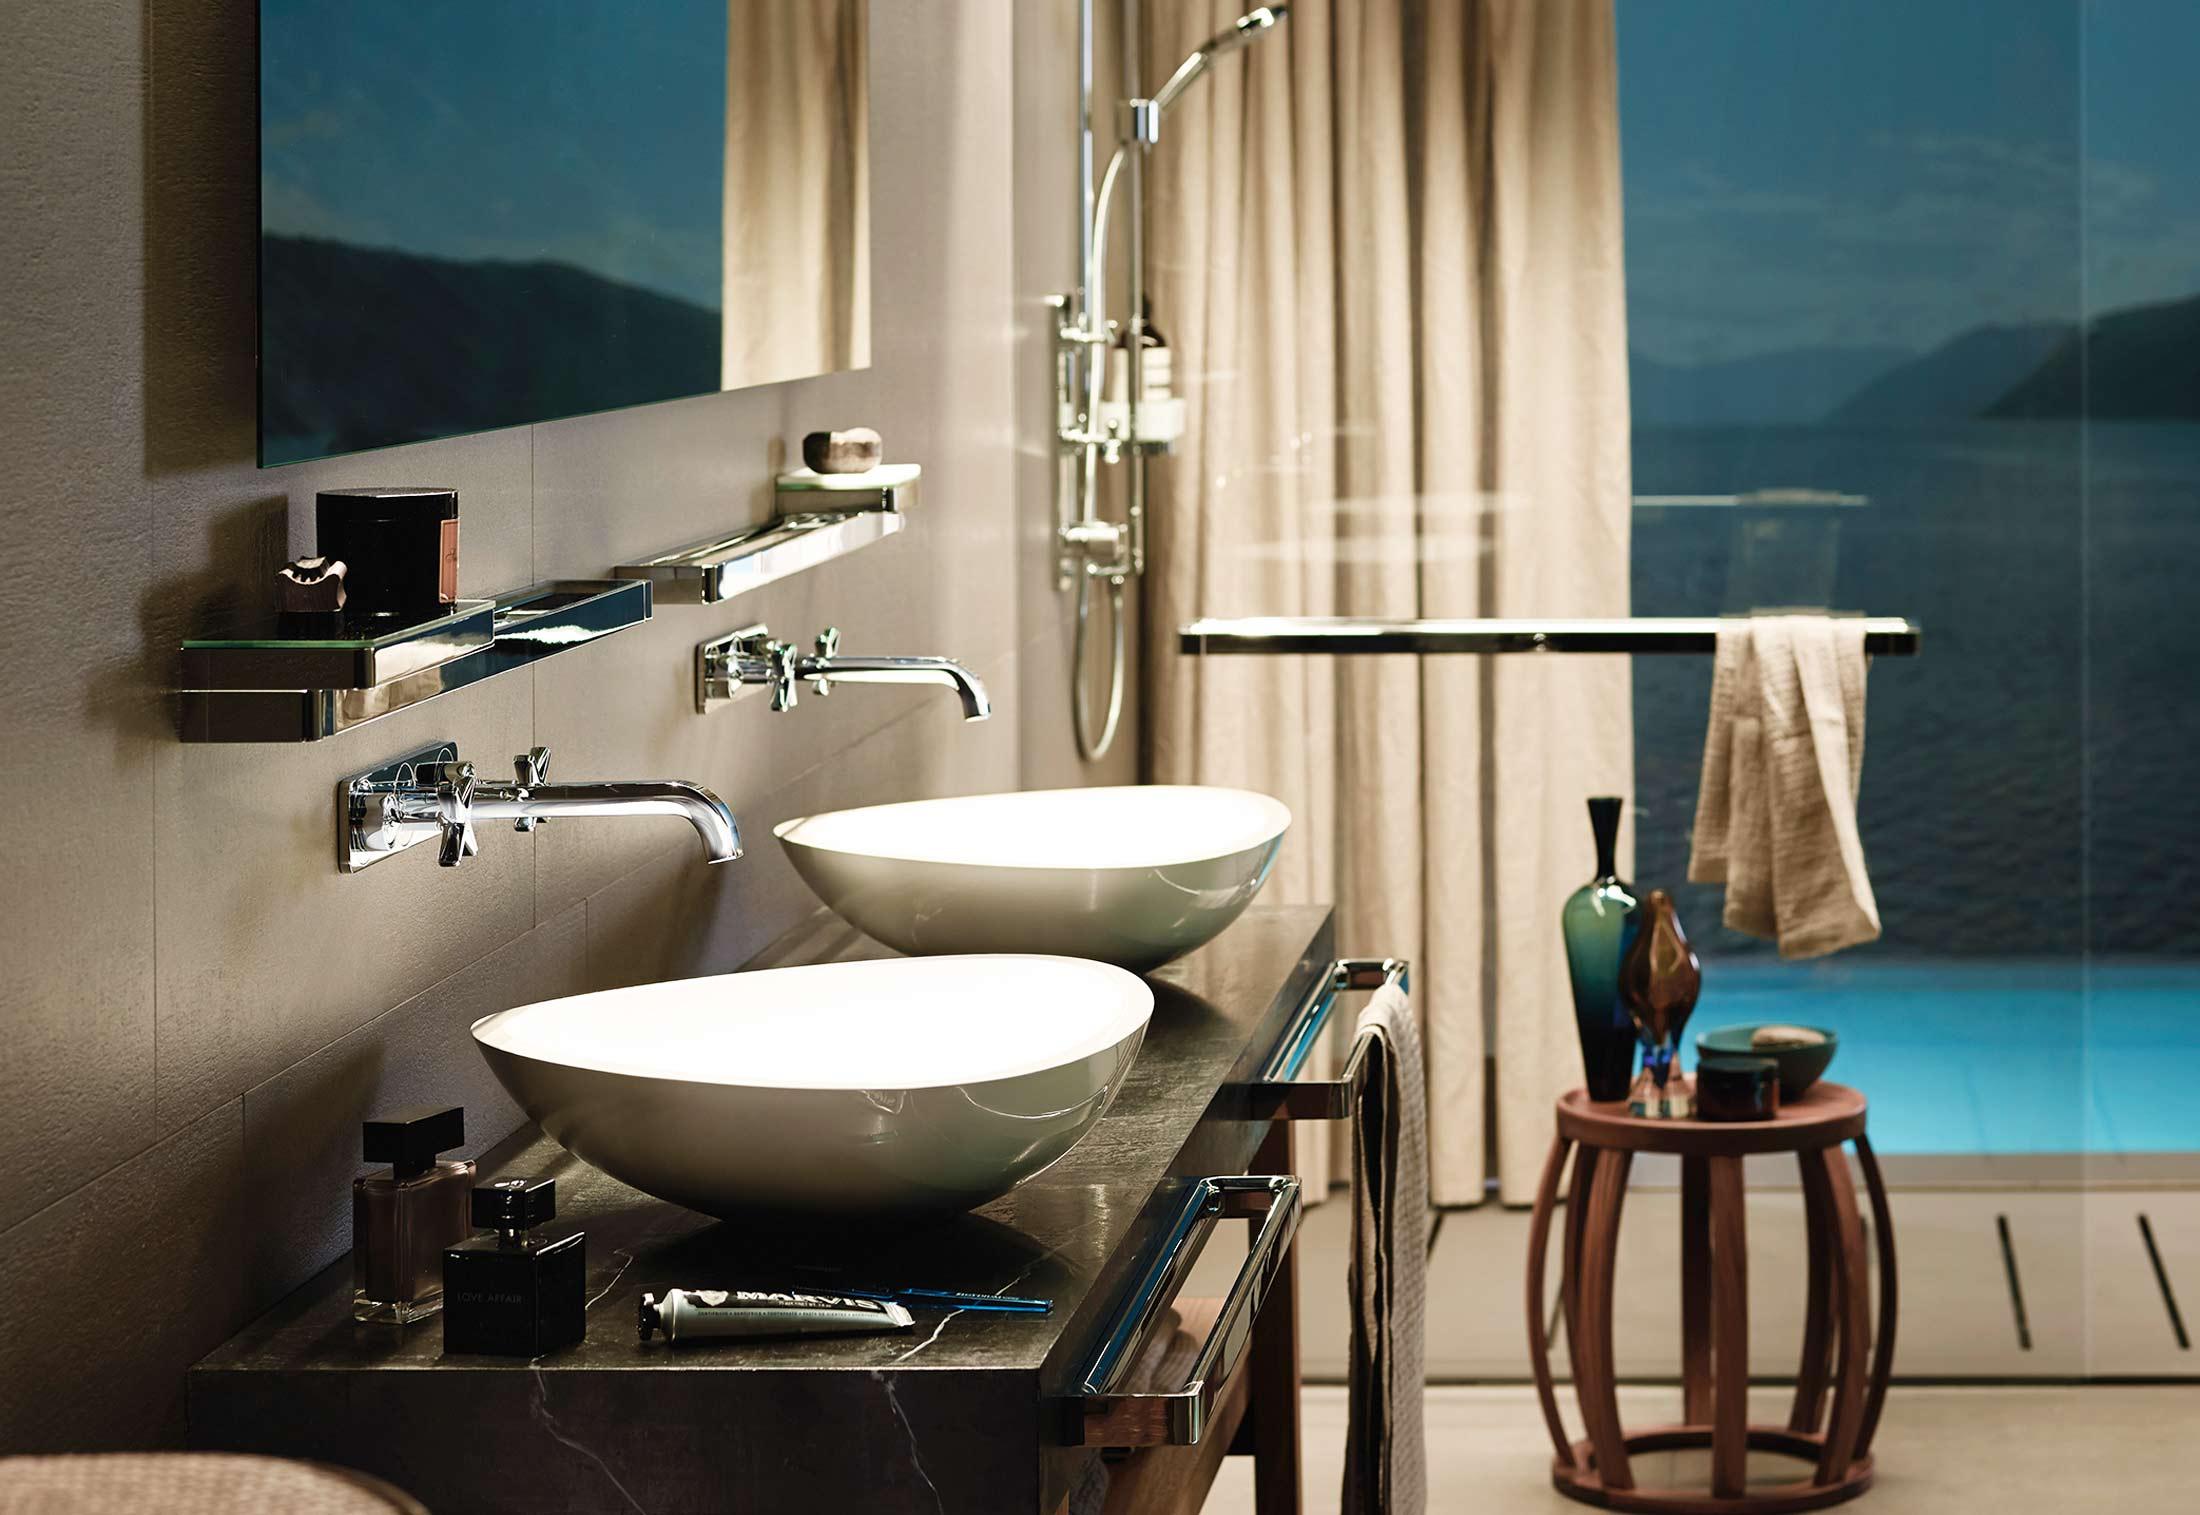 axor citterio e 3 loch waschtischarmatur unterputz. Black Bedroom Furniture Sets. Home Design Ideas